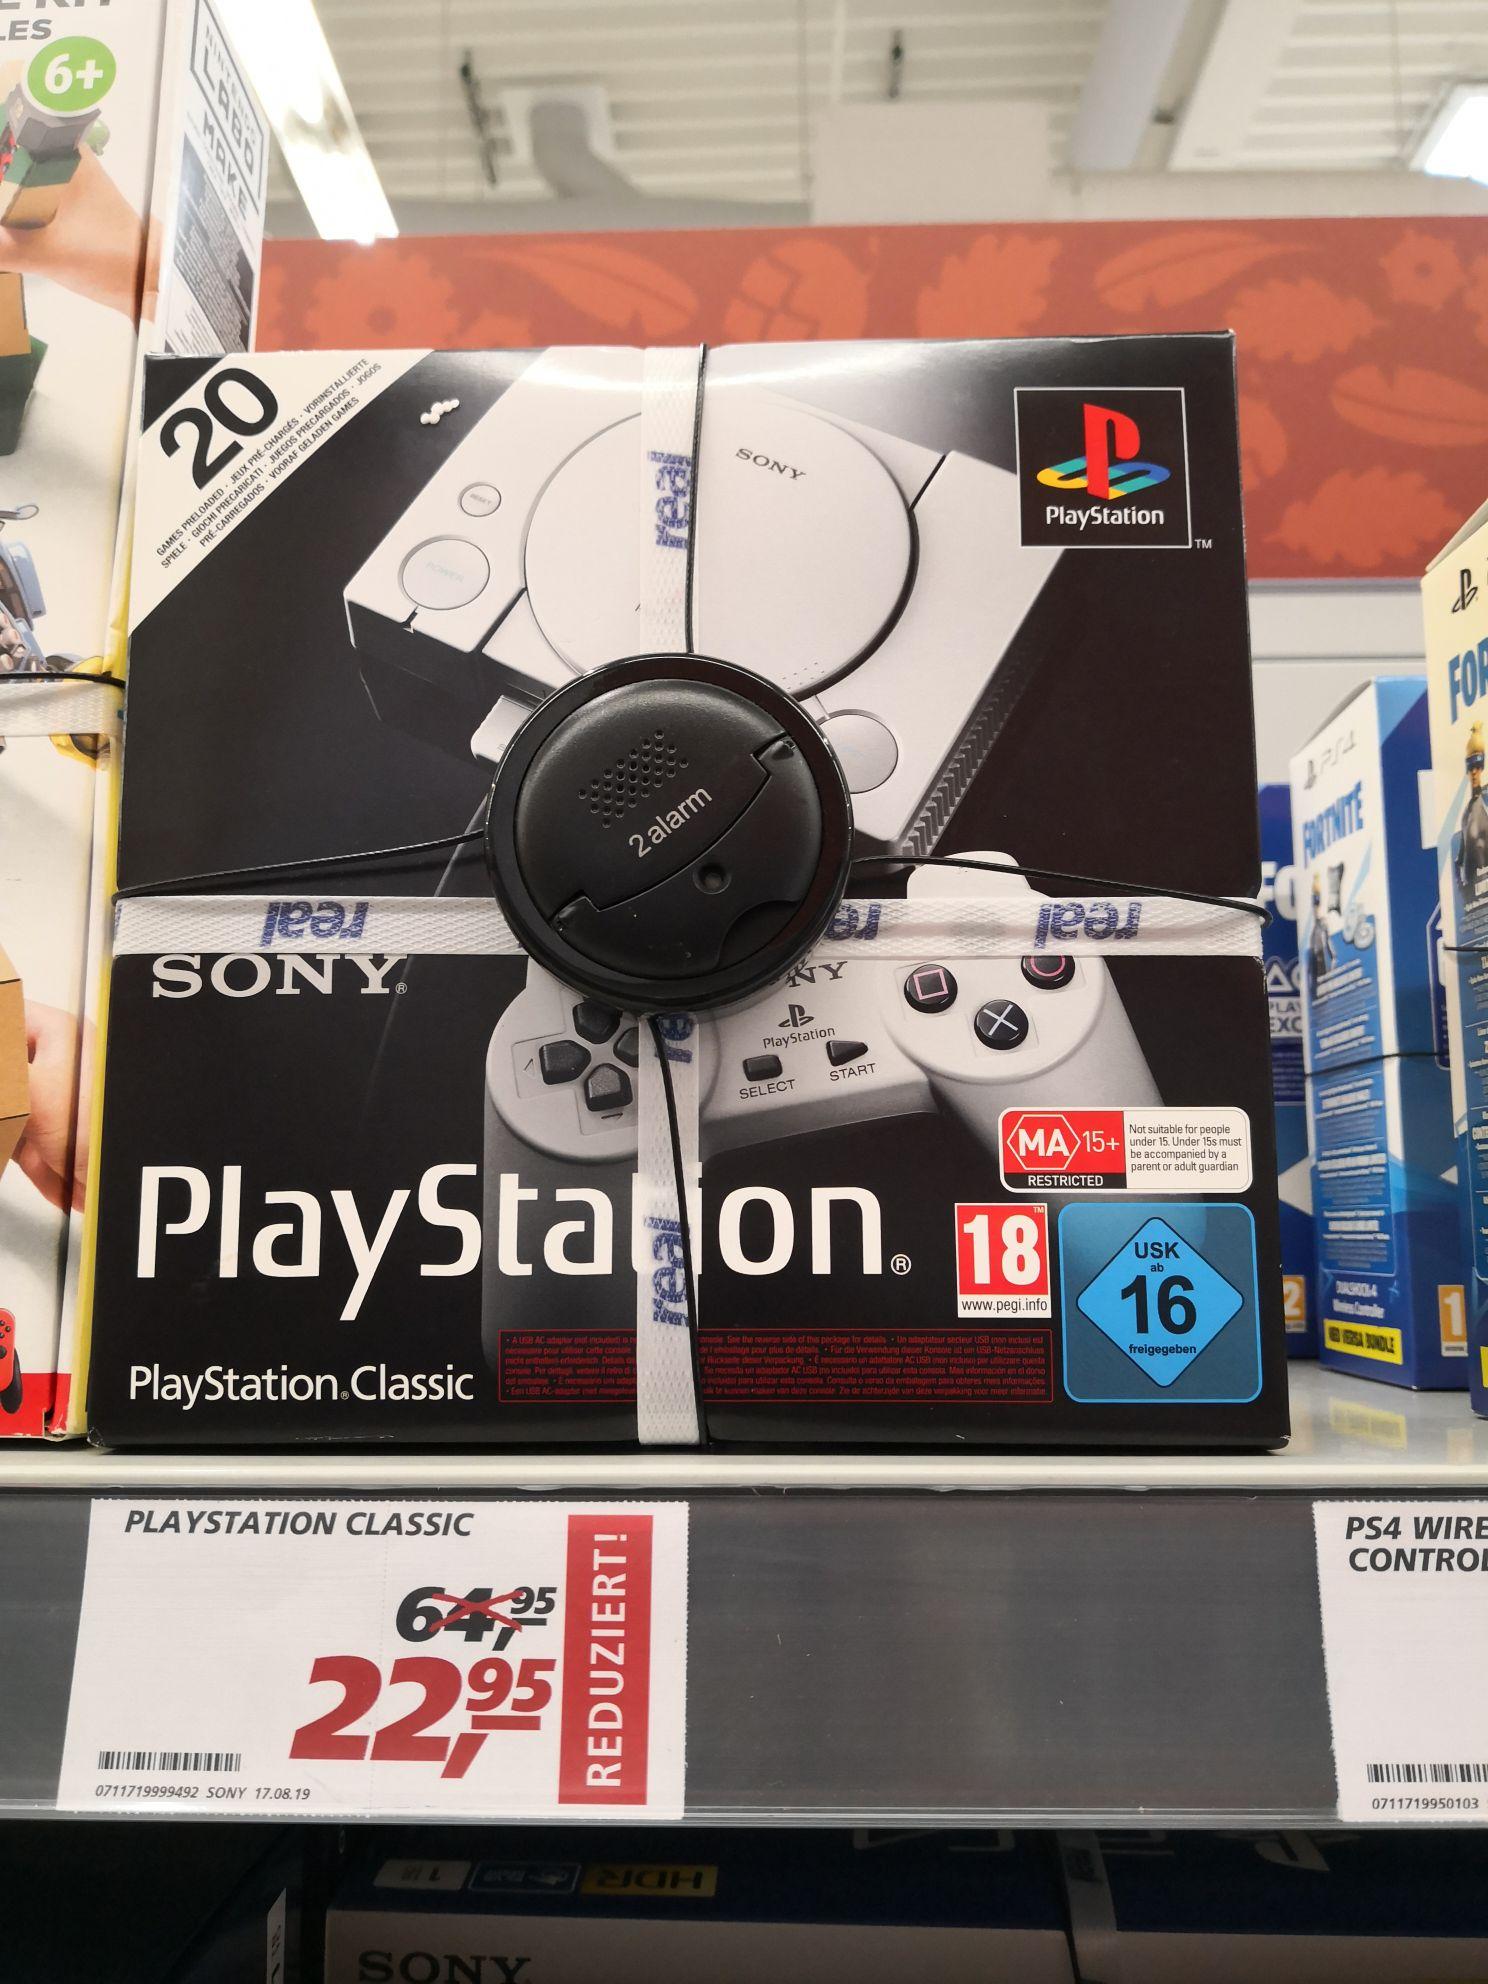 Playstation classic Mini bei real Rosenheim für 22,95 €